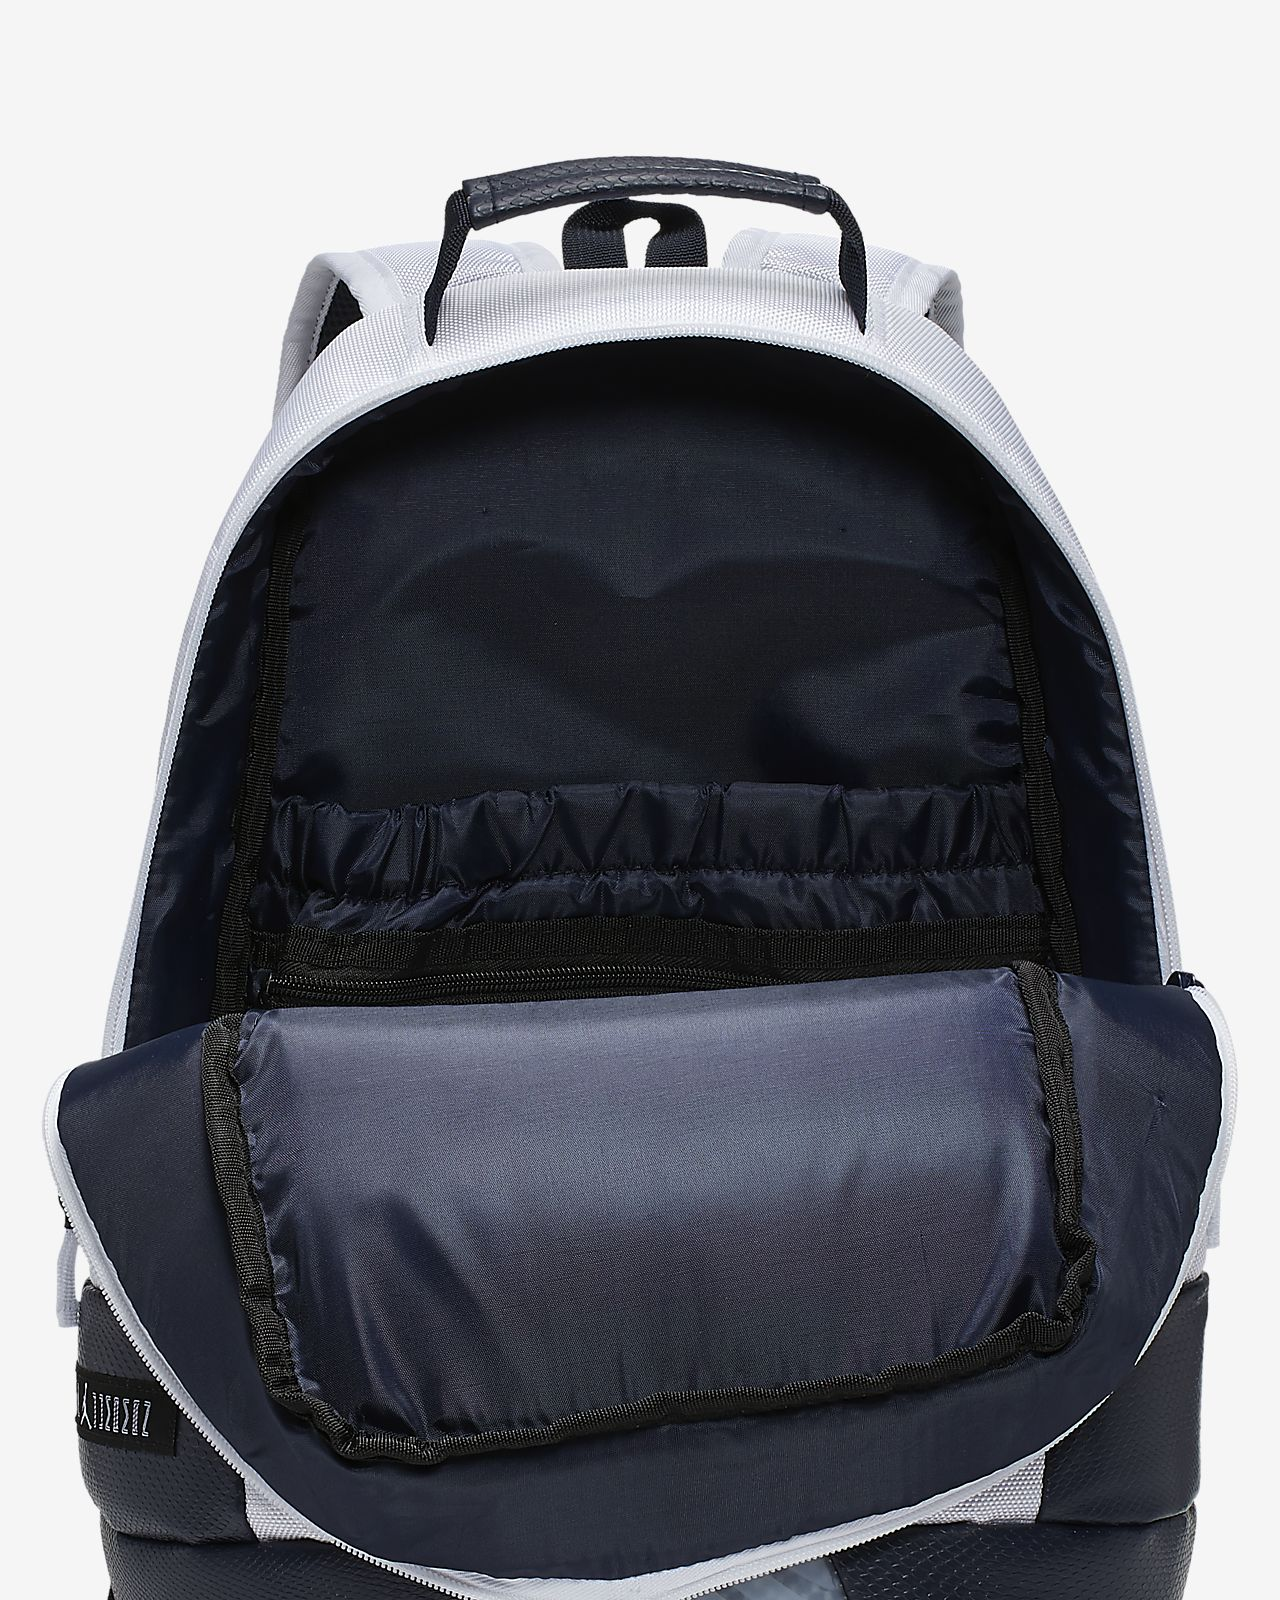 cfd8c0ad9e46e6 Low Resolution Jordan Retro 11 Backpack Jordan Retro 11 Backpack